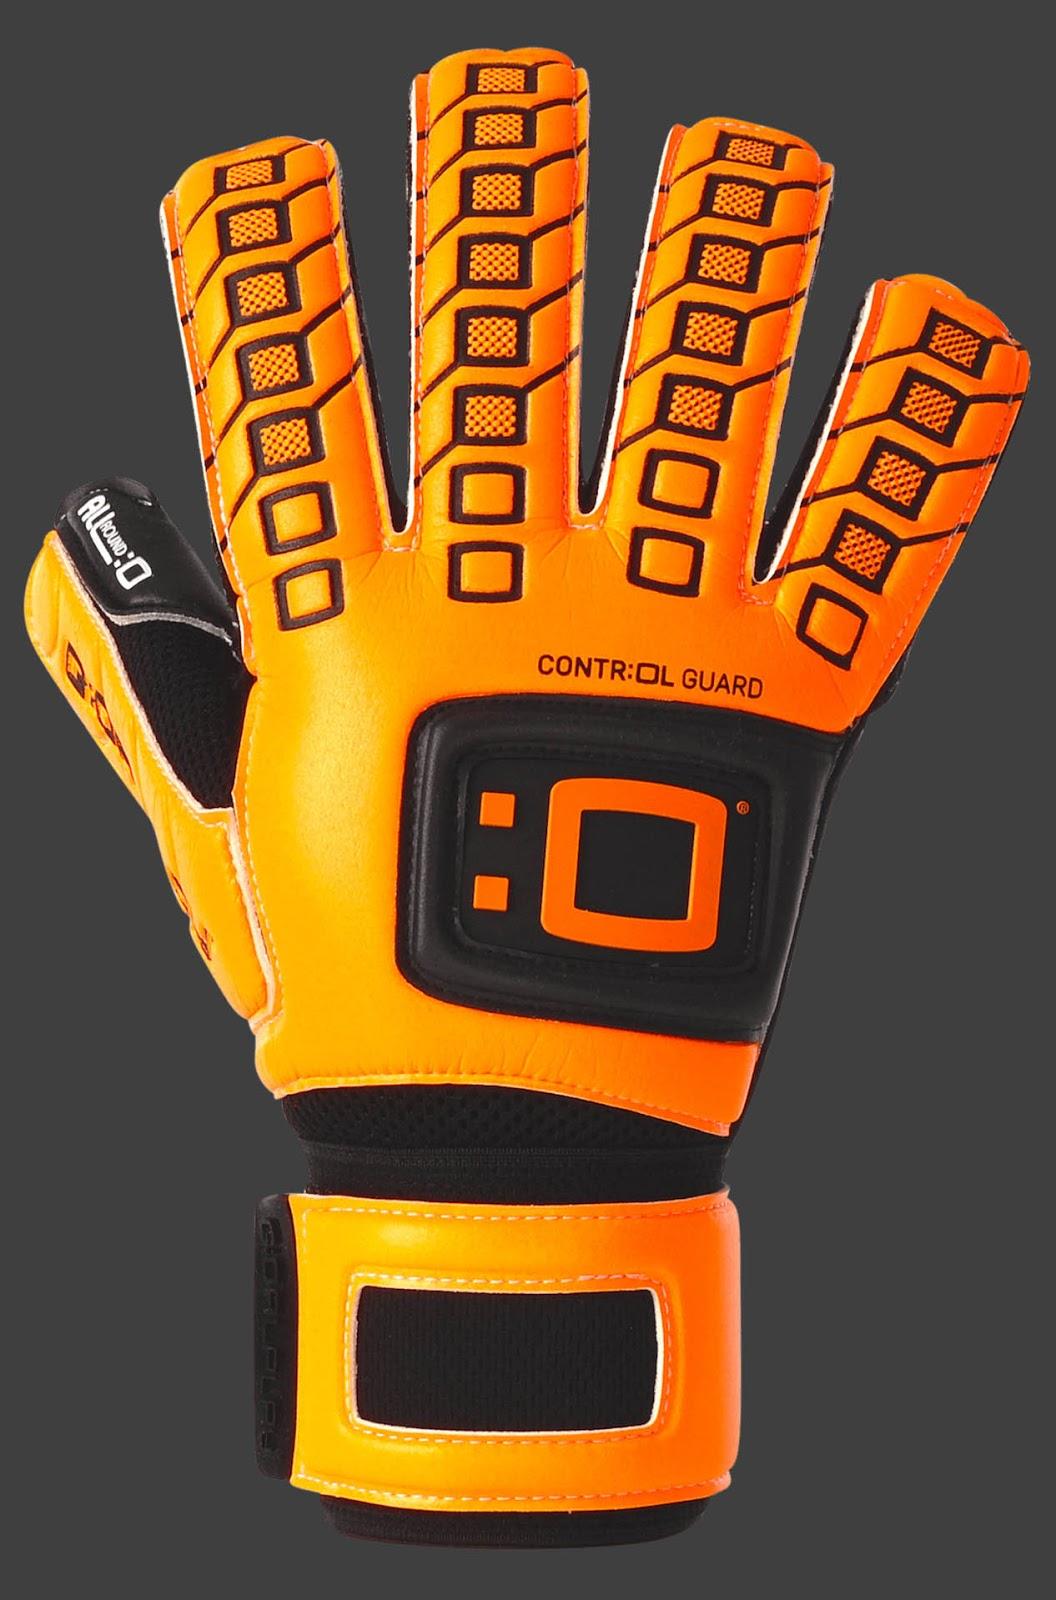 goodbye-adidas-oliver-kahn-launches-goalkeeper-brand-orange